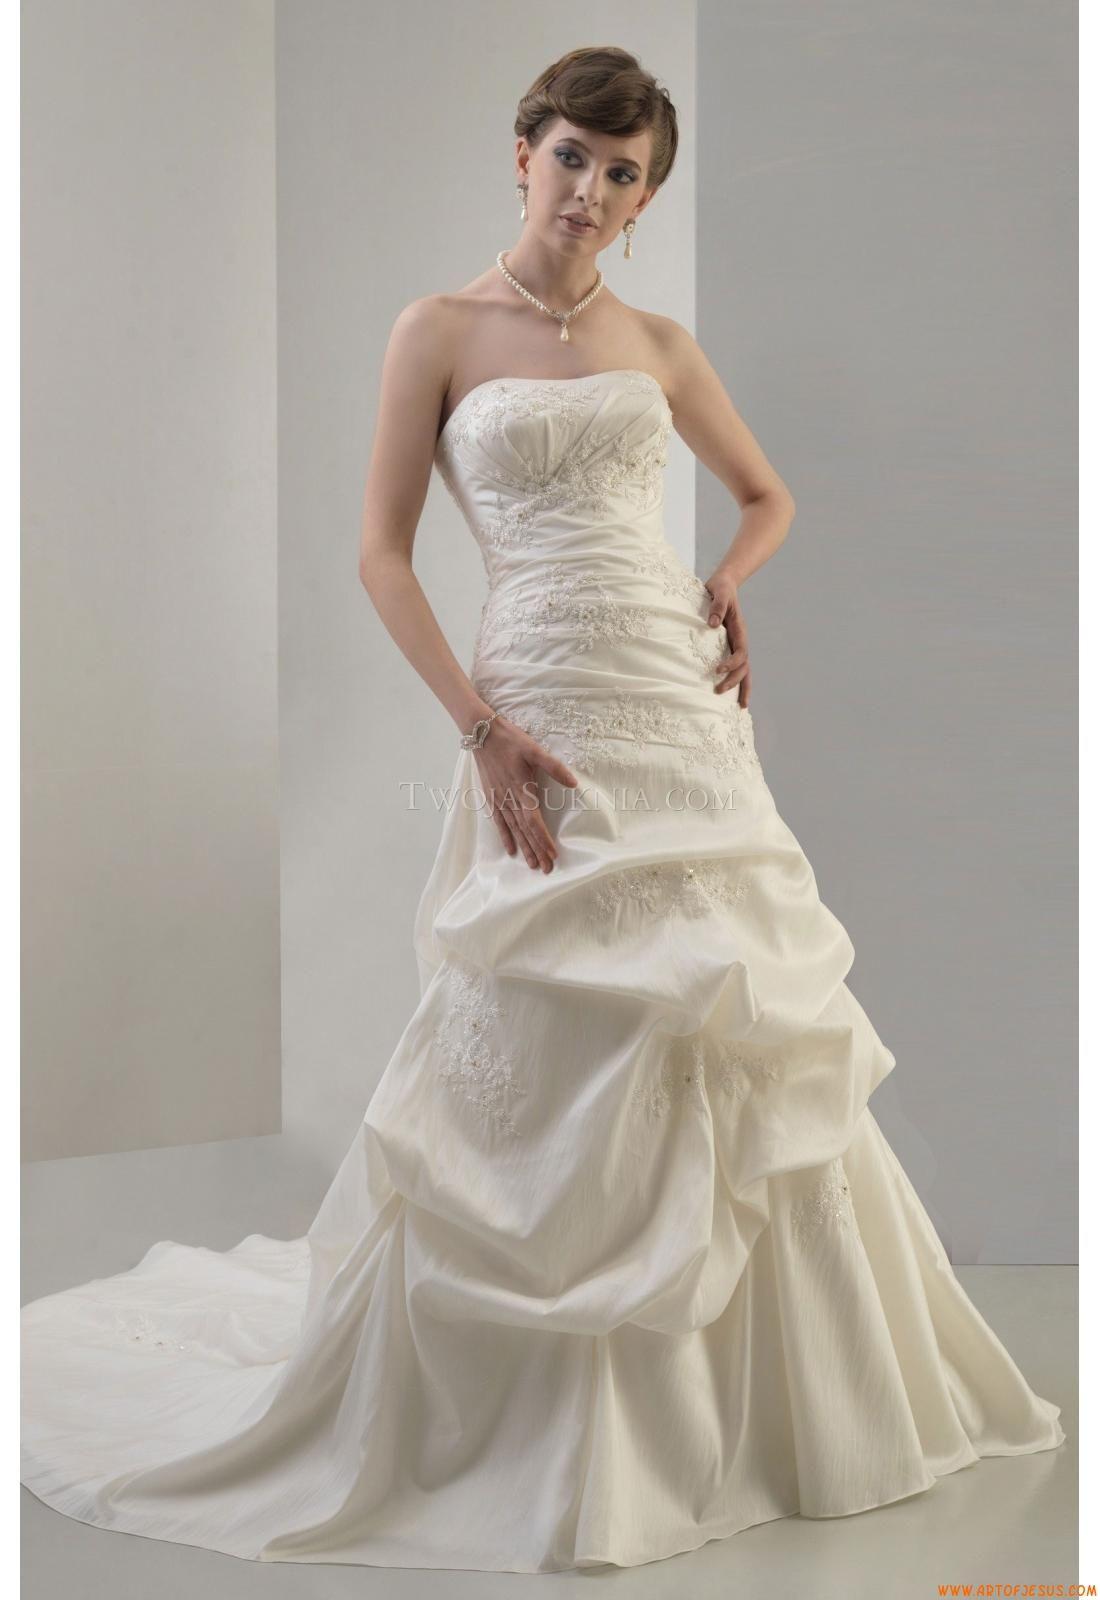 Elegant Strapless Court Train Unique Wedding Dress Venus AT4461 Angel Tradition 2011